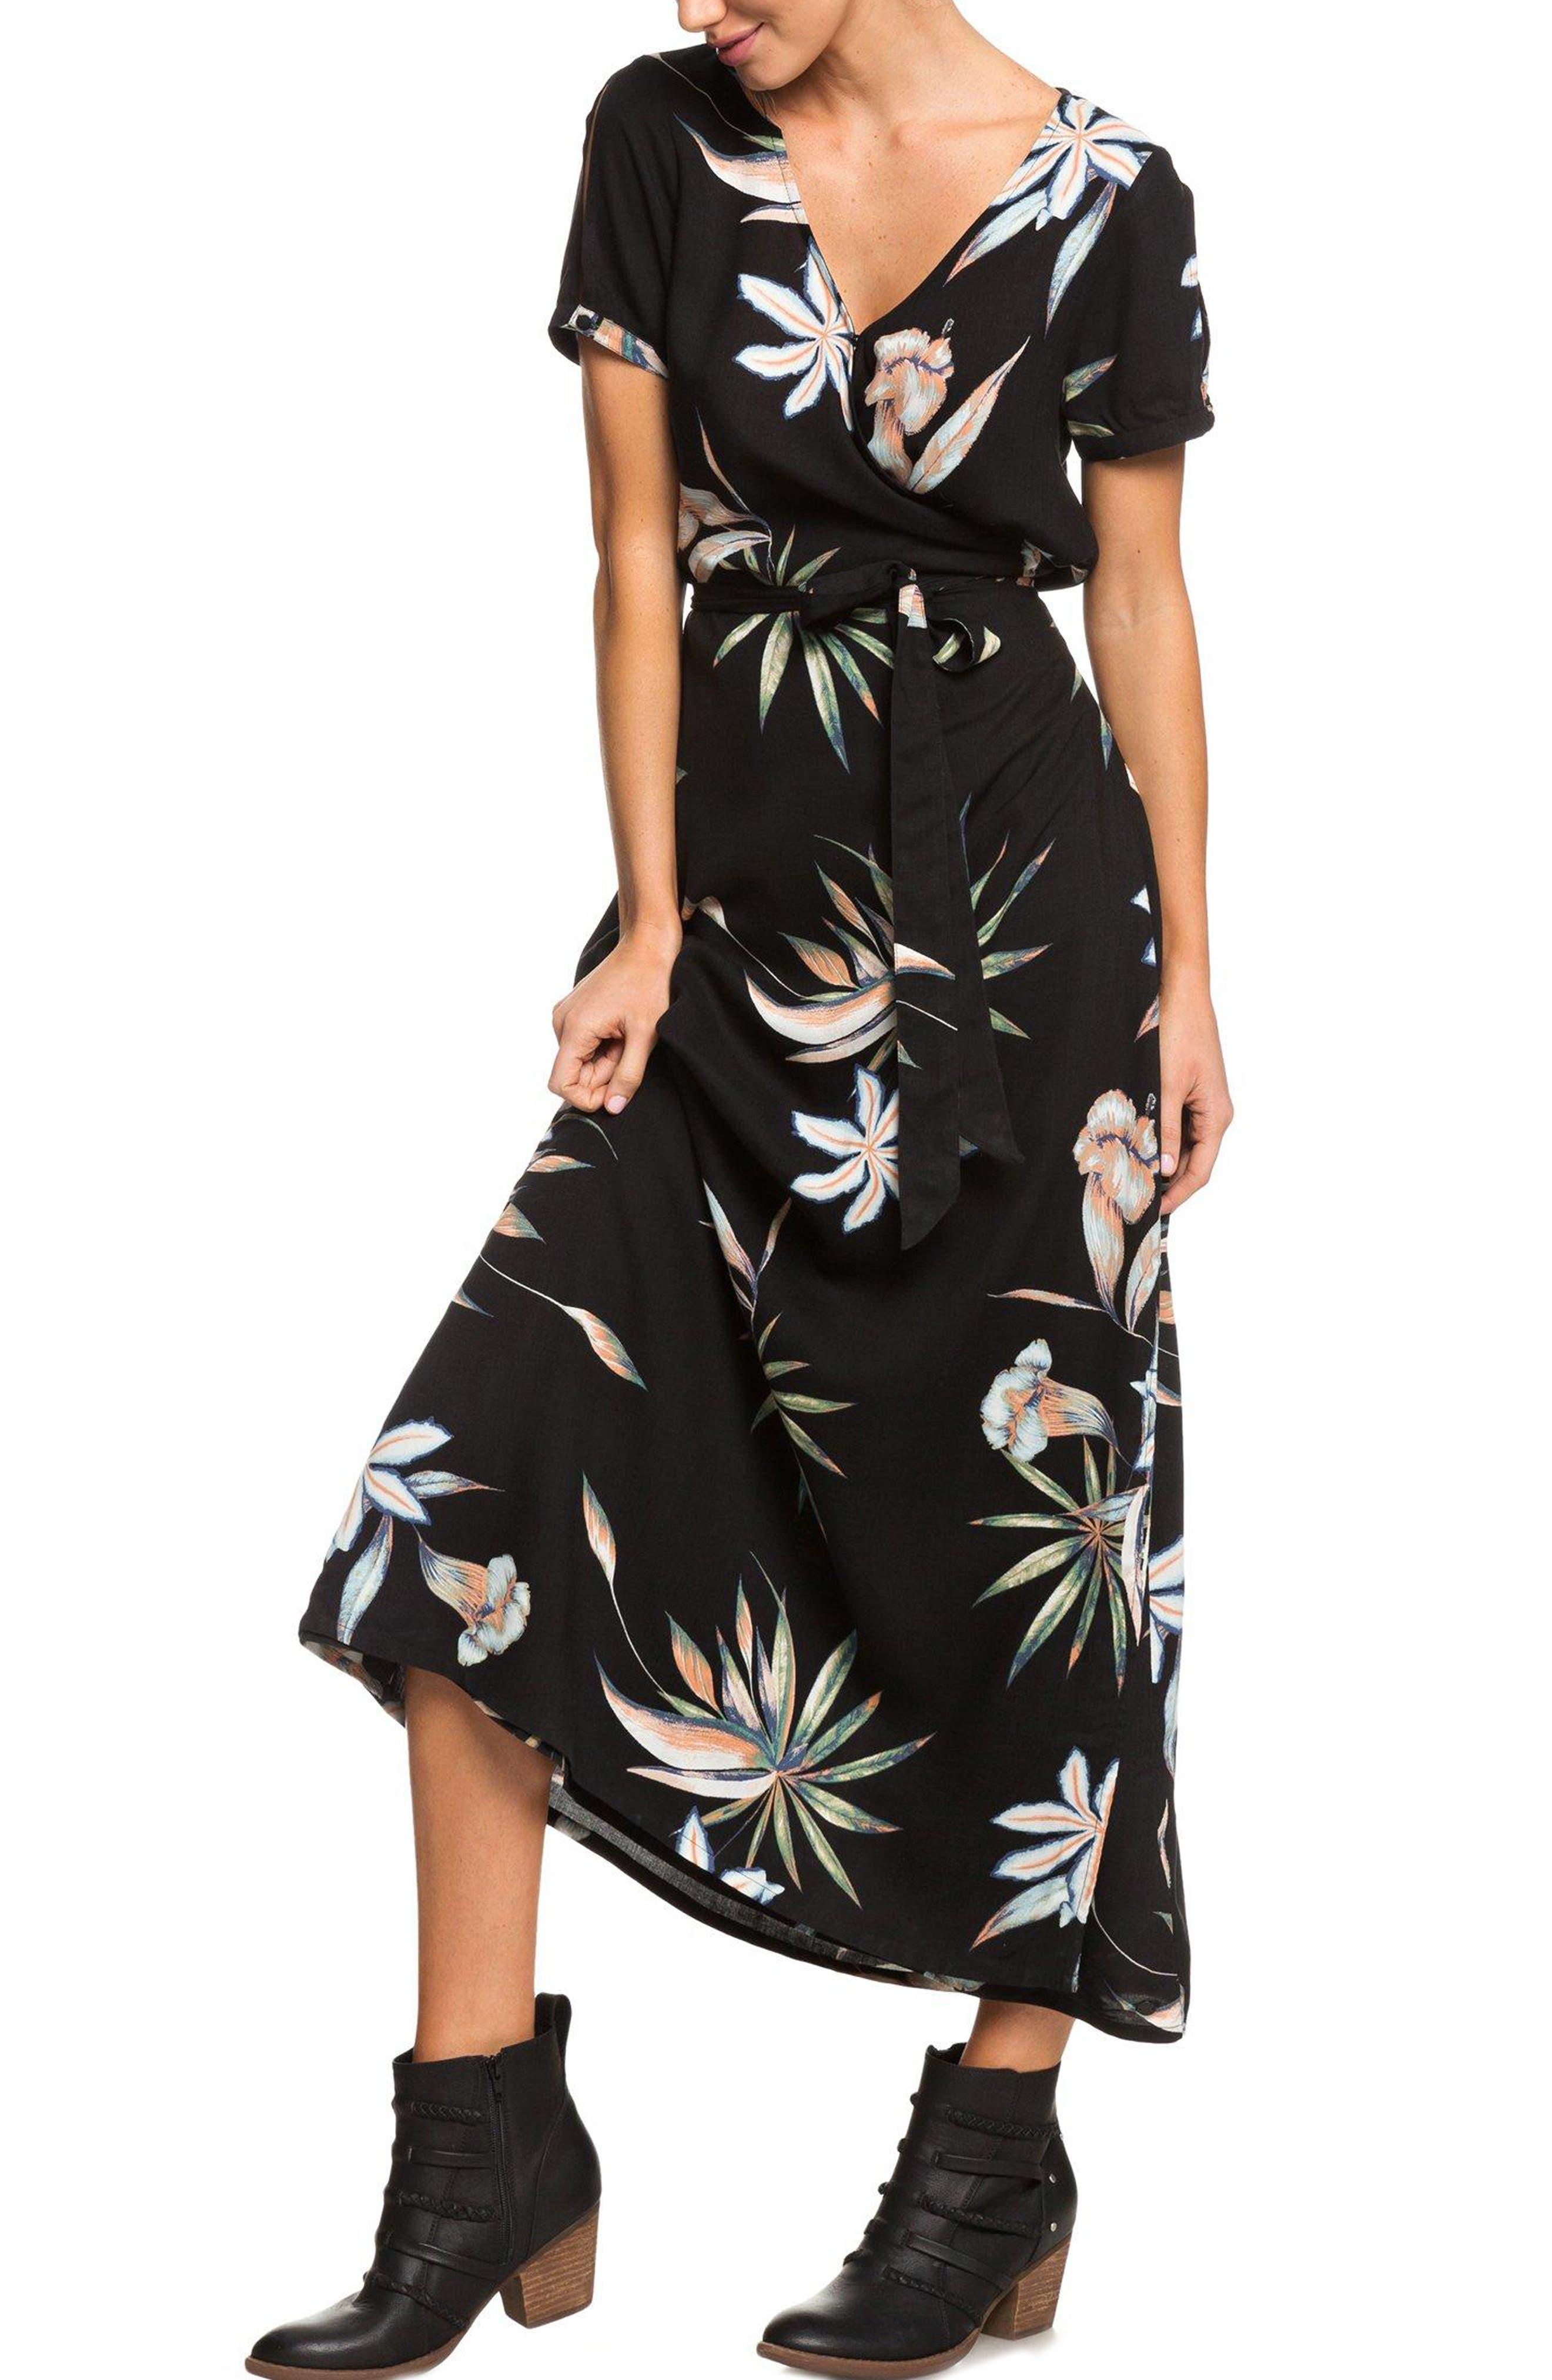 Lotus Heart Midi Dress,                             Main thumbnail 1, color,                             TRUE BLACK NIGHTLIGHTS